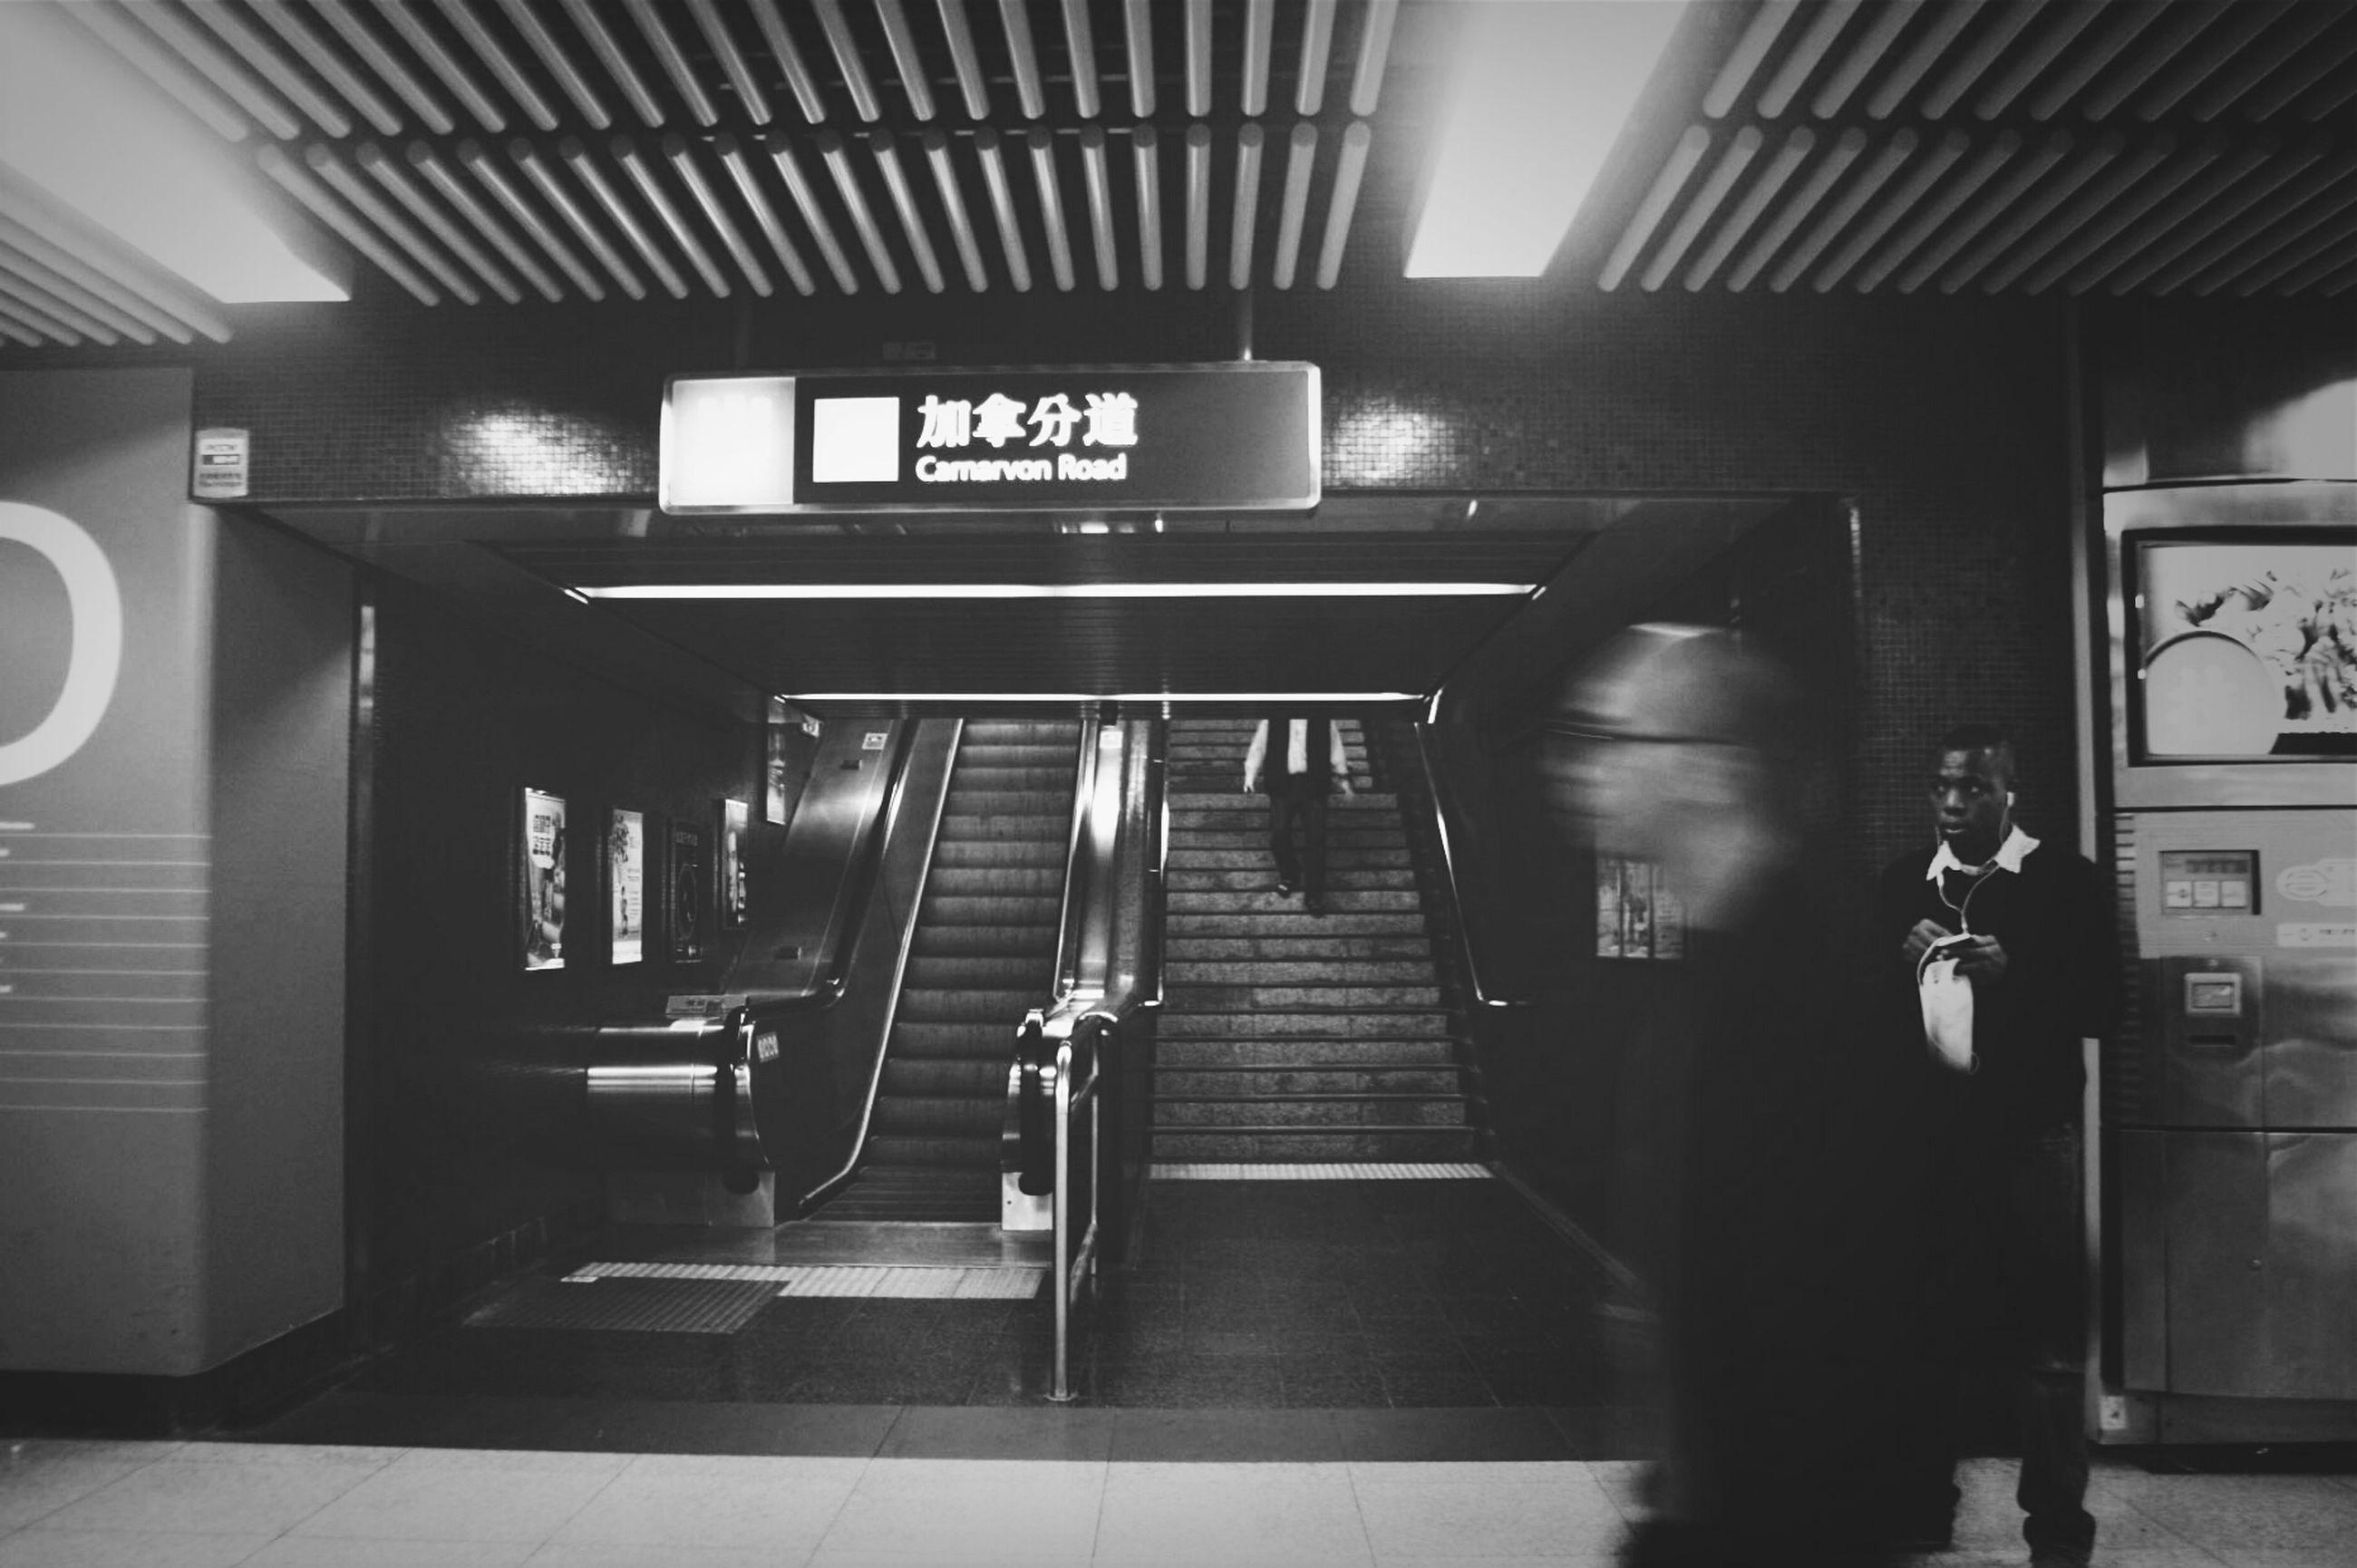 indoors, illuminated, subway, subway station, text, architecture, railroad station, ceiling, communication, built structure, men, public transportation, western script, transportation, modern, person, railroad station platform, technology